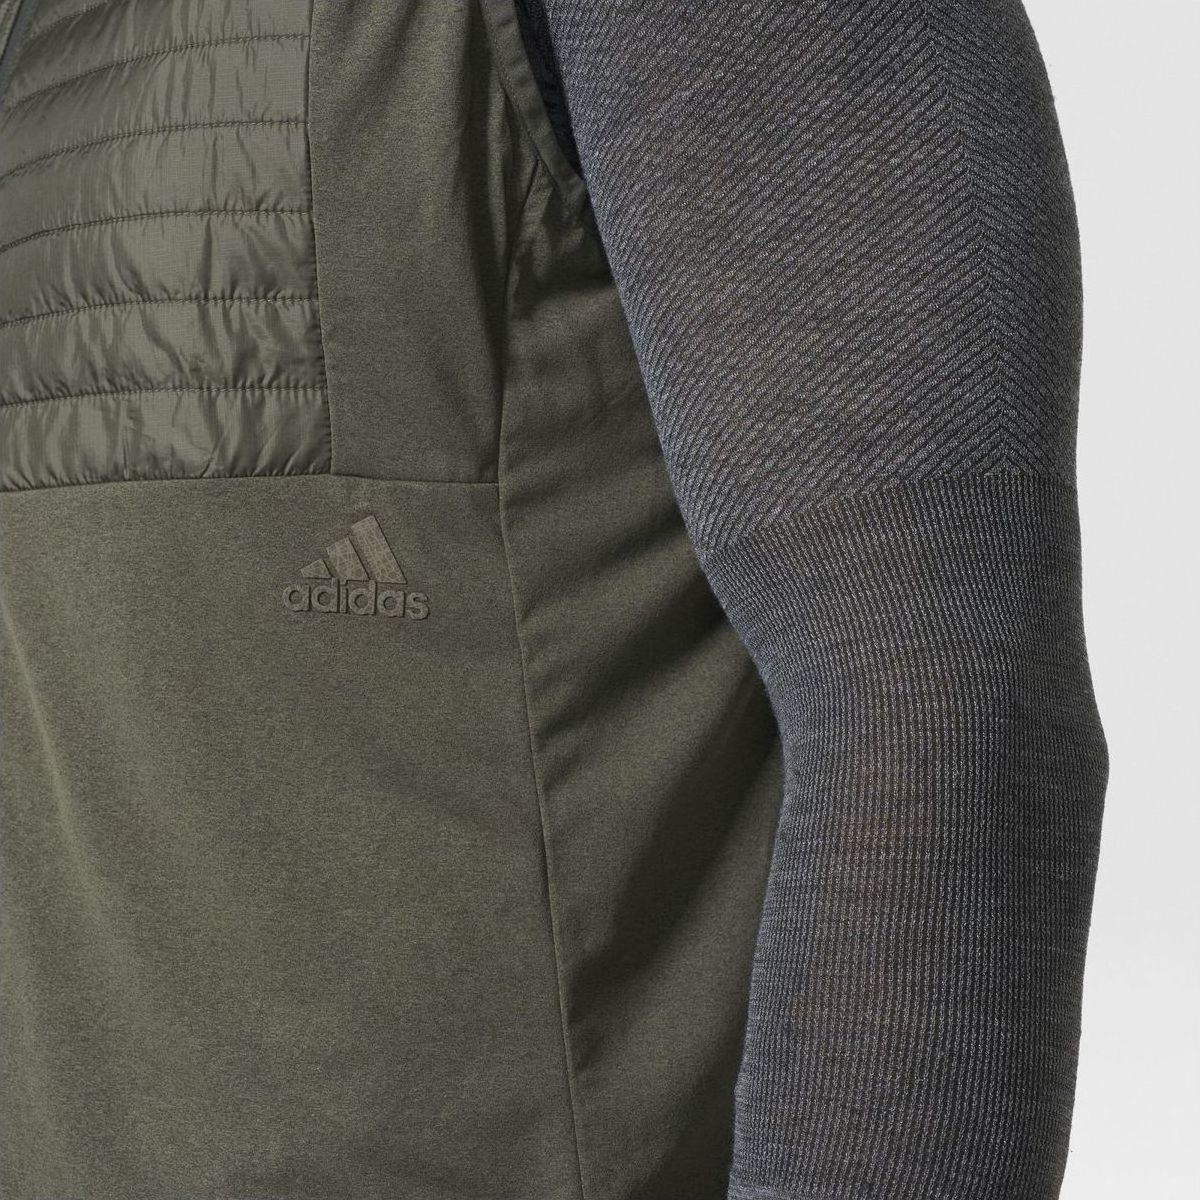 Adidas Ultra Energy Vest AZ2901 - Skroutz.gr 2e0130232e4